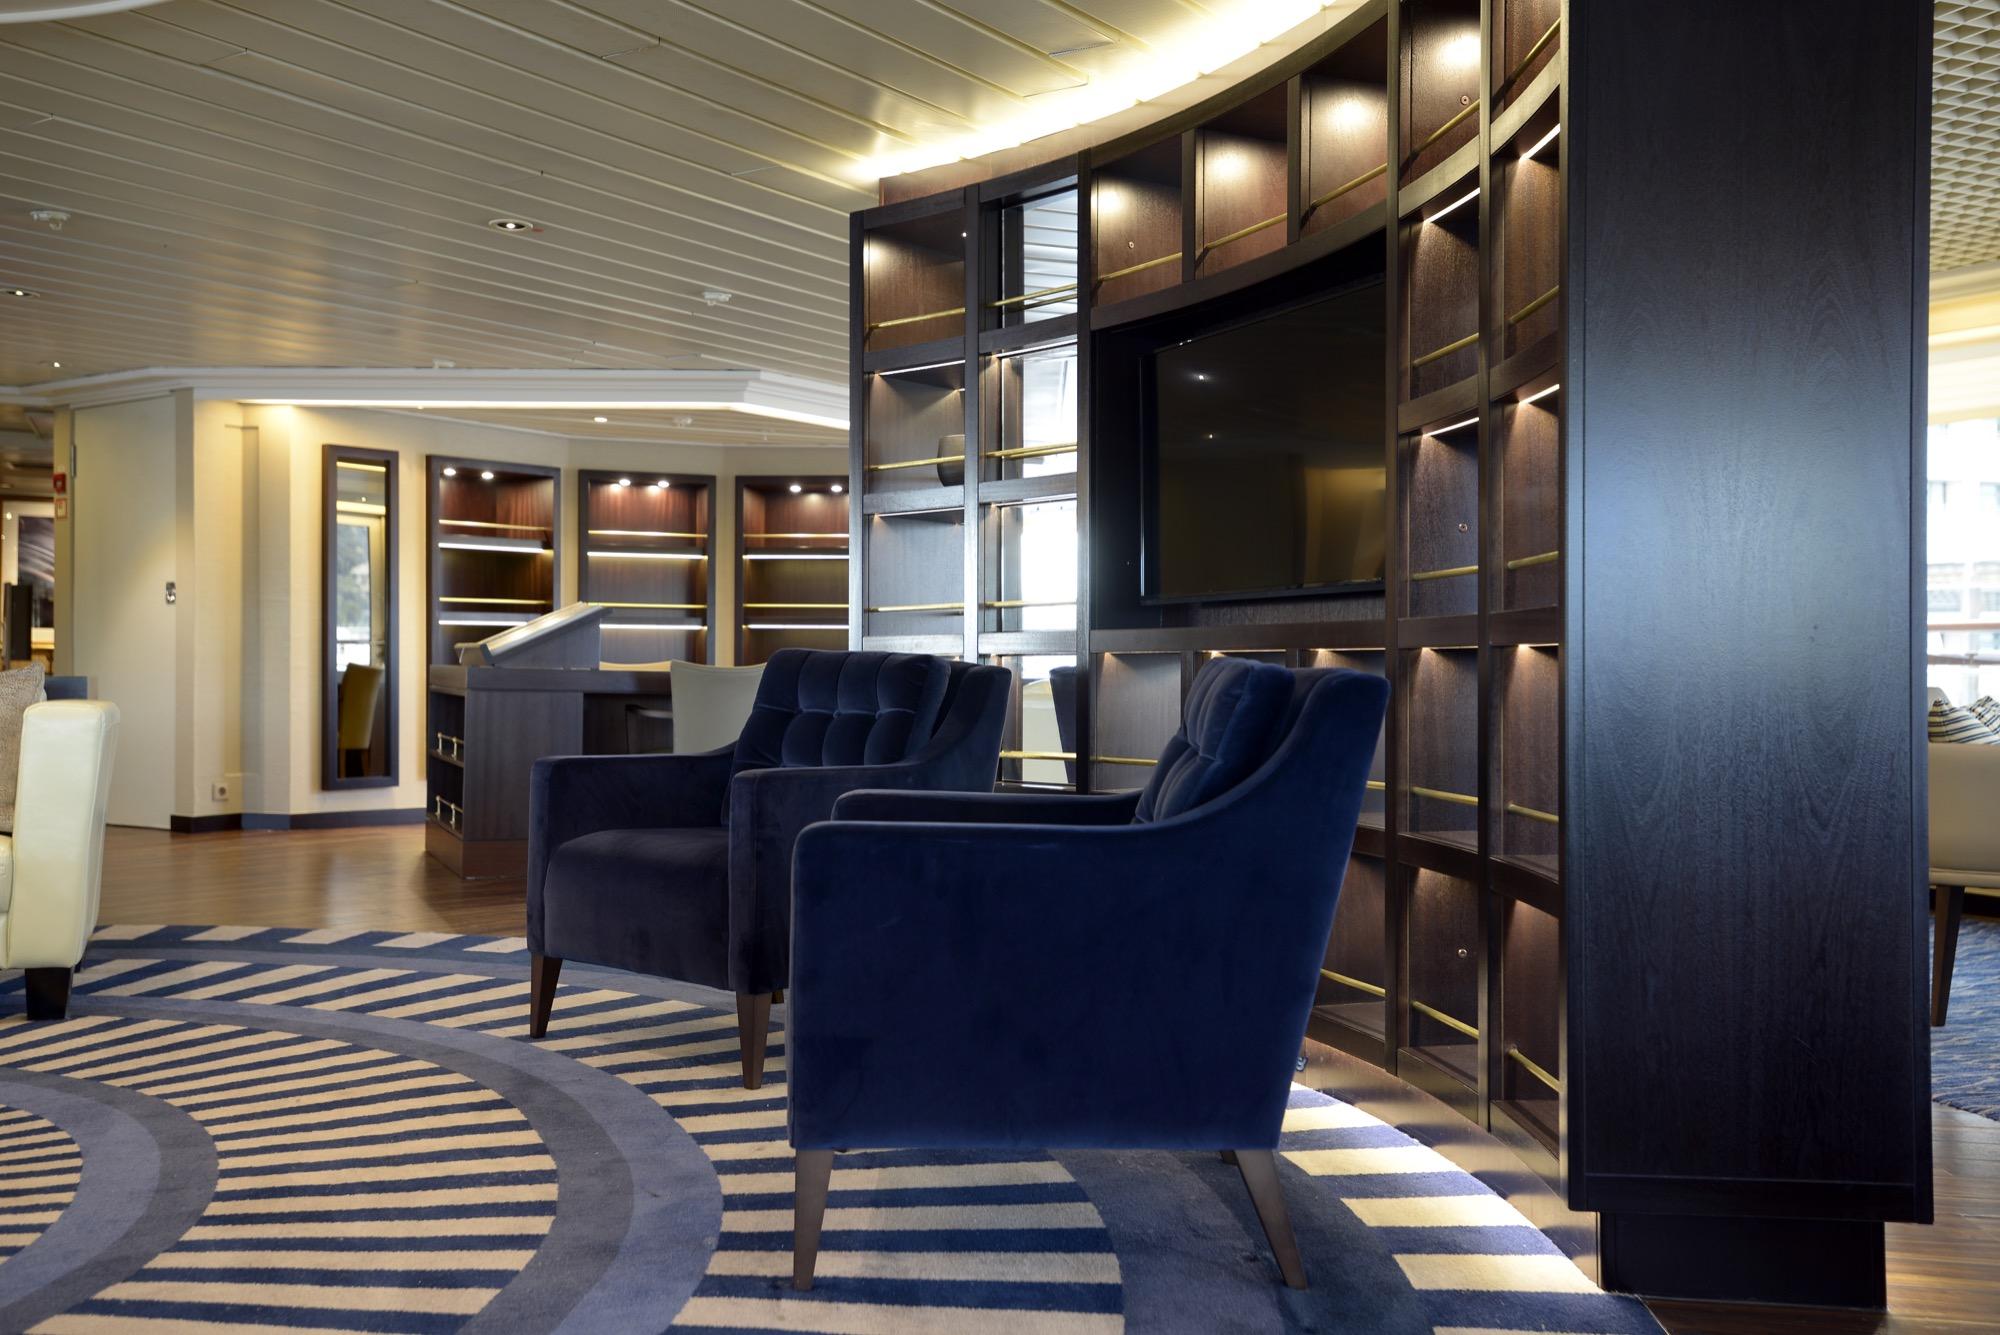 Windstar Star Pride Interior Yacht Club 18.jpg